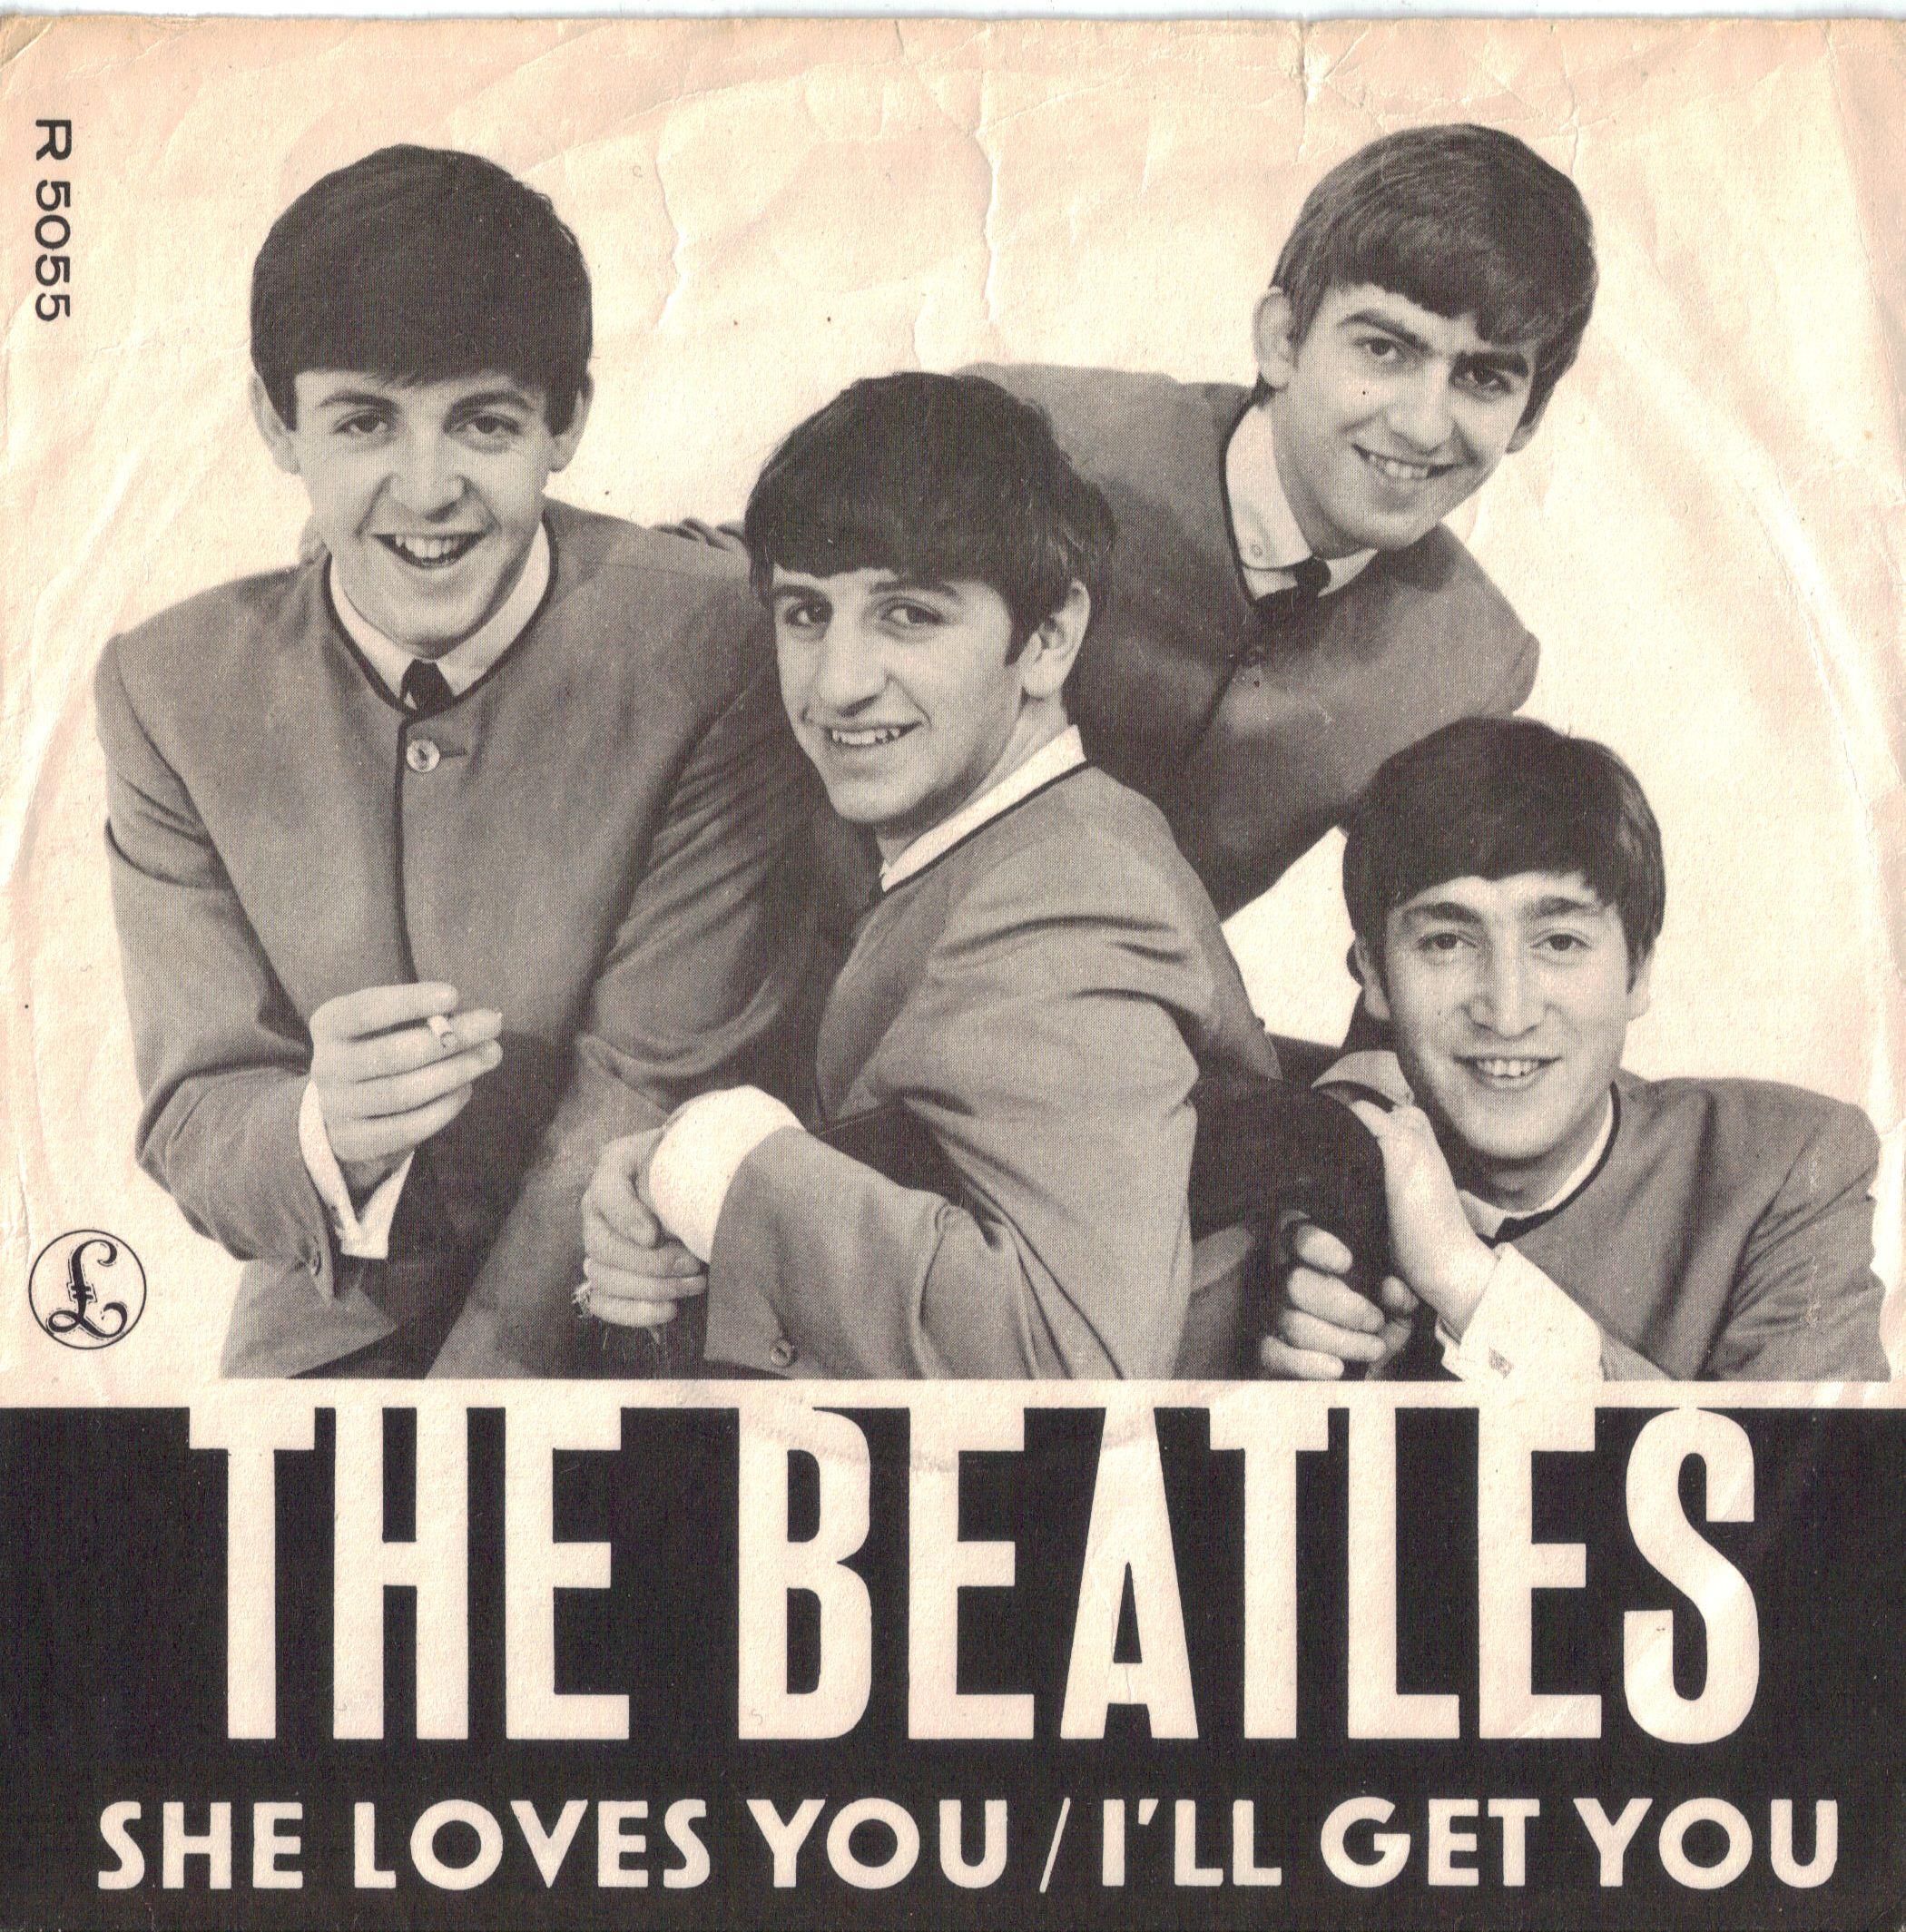 COVER VERSIONS OF BEATLES SONGS